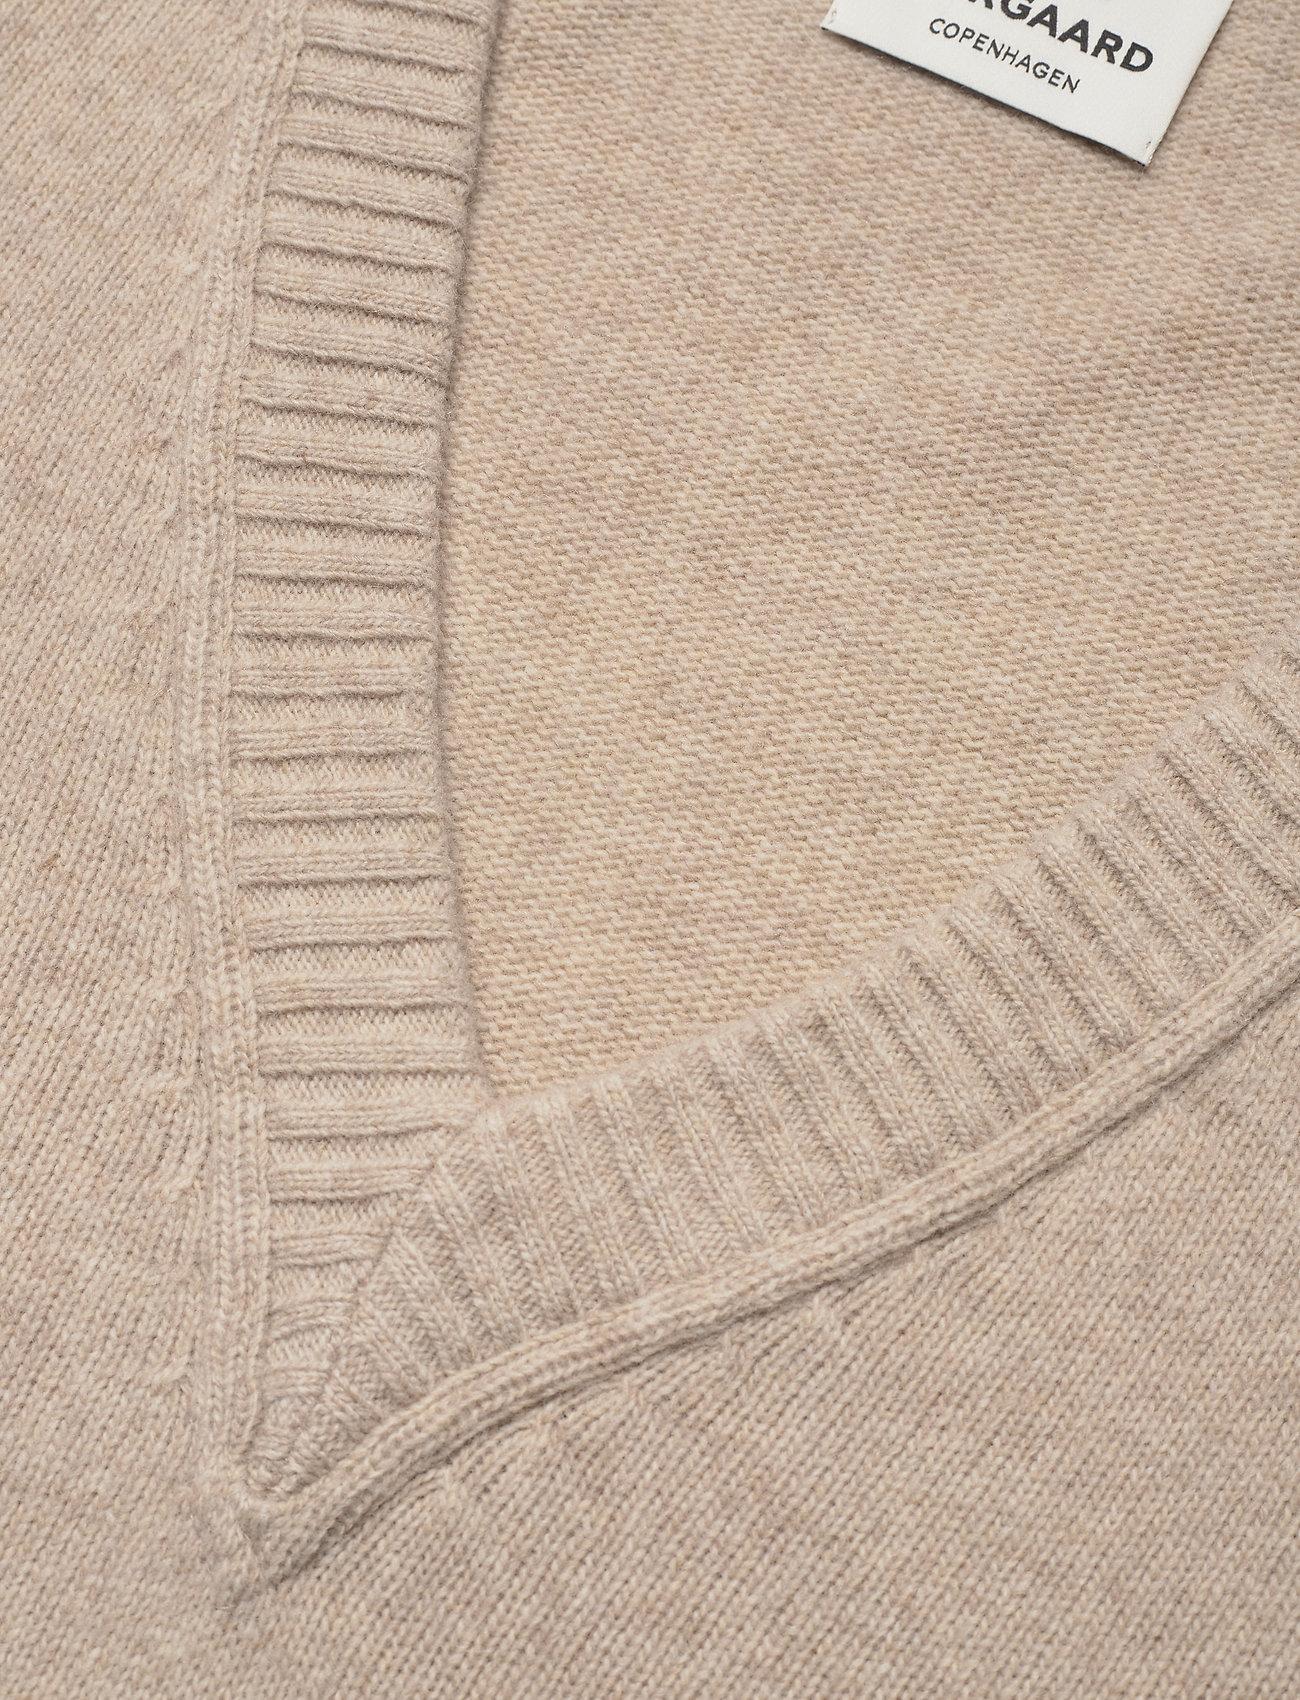 Mads Nørgaard - Recy Soft Knit Vanessa - knitted vests - beige - 2